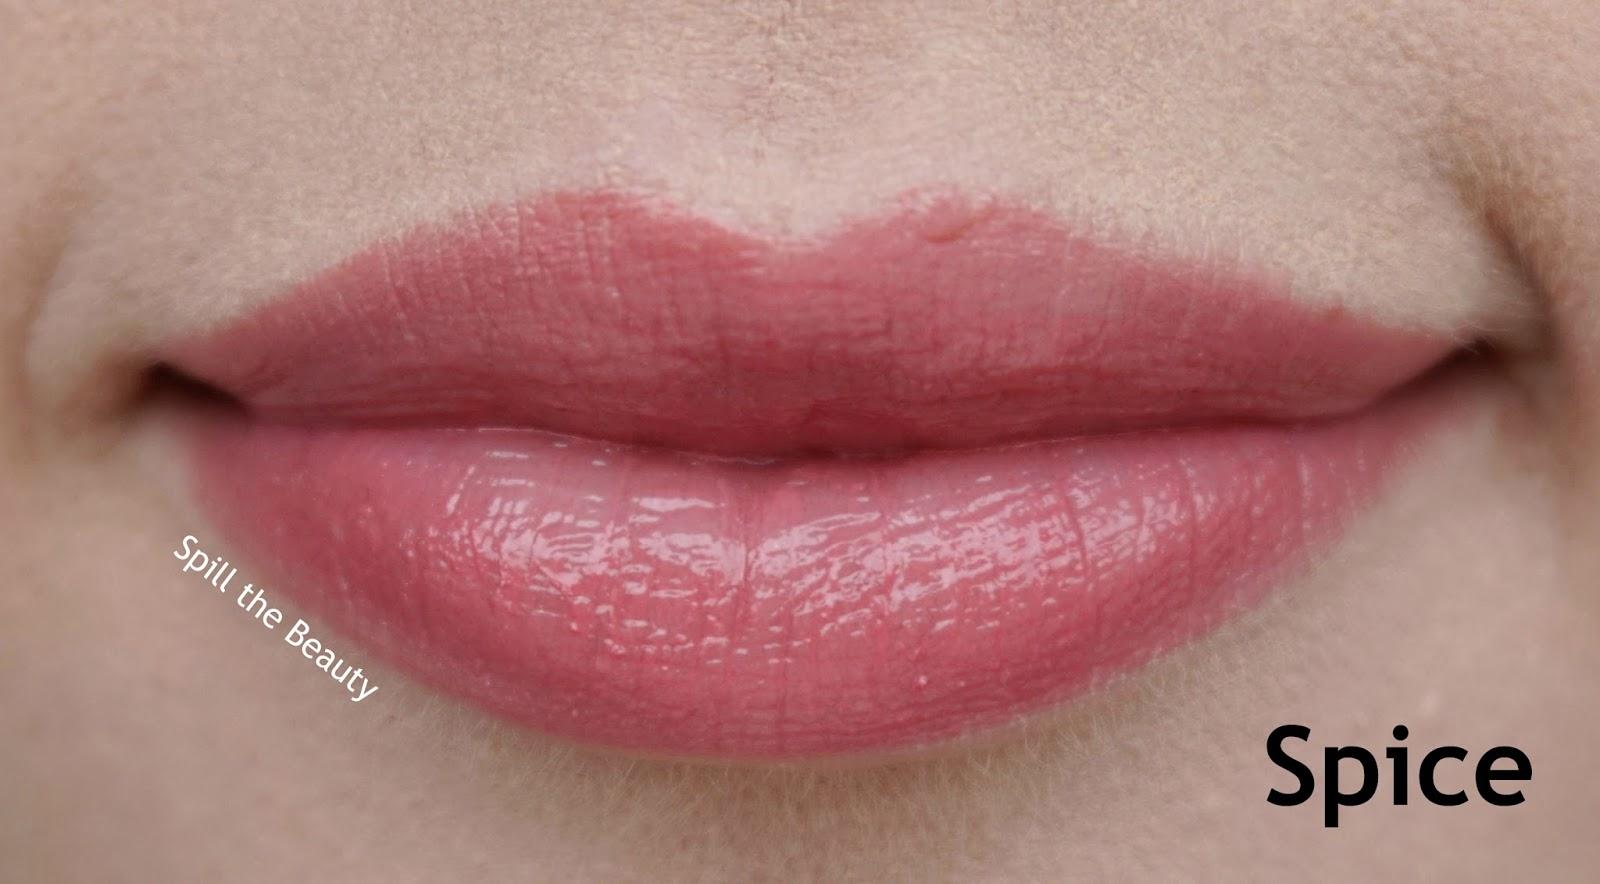 joe fresh 2017 eyeshadow eyeliner highlighter stick lip balm review swatches spice